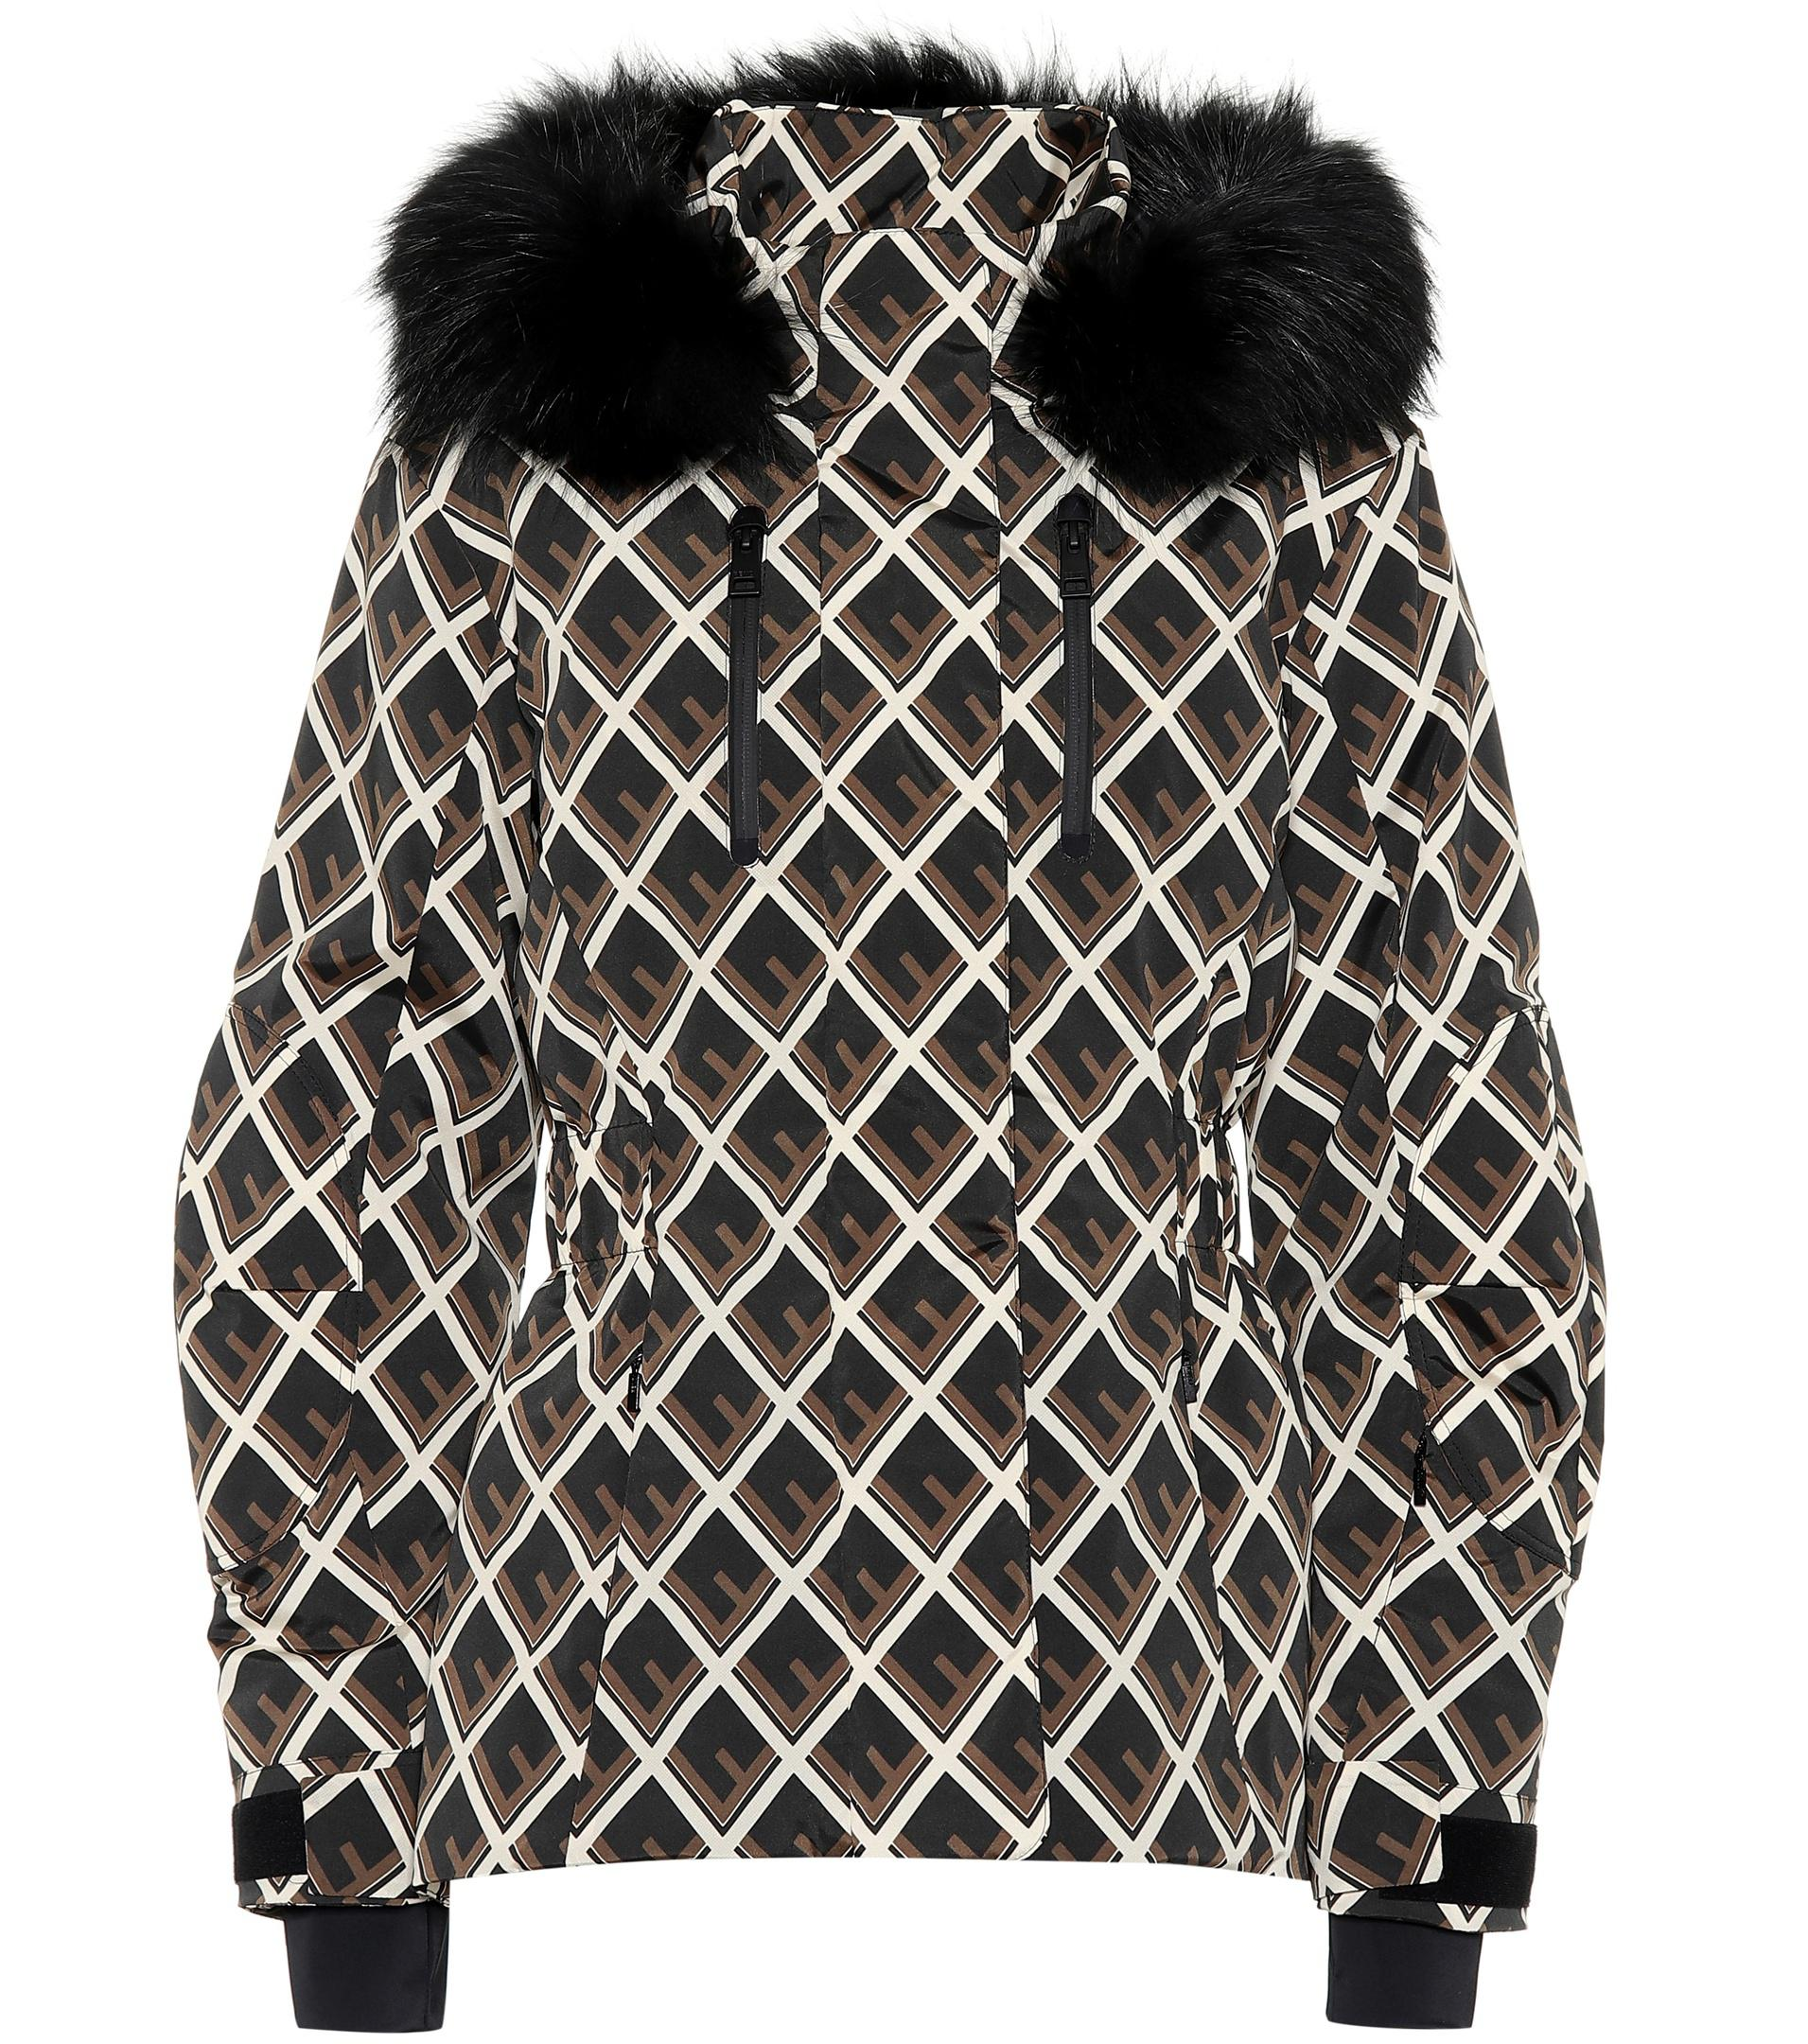 d5d00386 Fendi Printed Fur-trimmed Ski Jacket in Black - Lyst